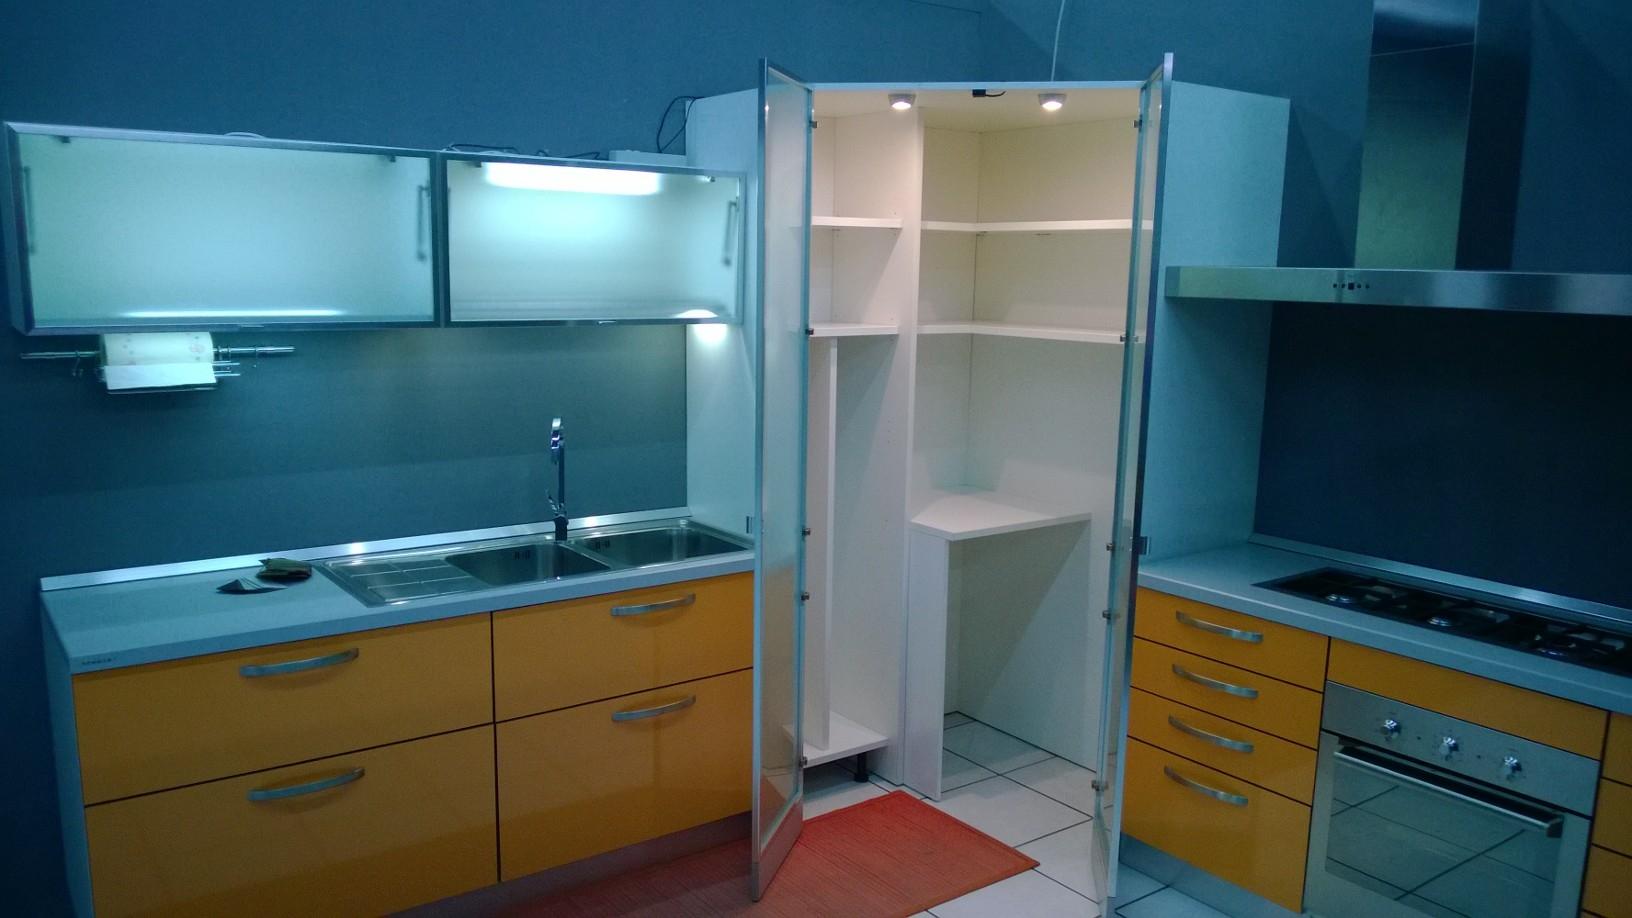 Cucina showroom scontata cucine a prezzi scontati - Cucina con dispensa ...